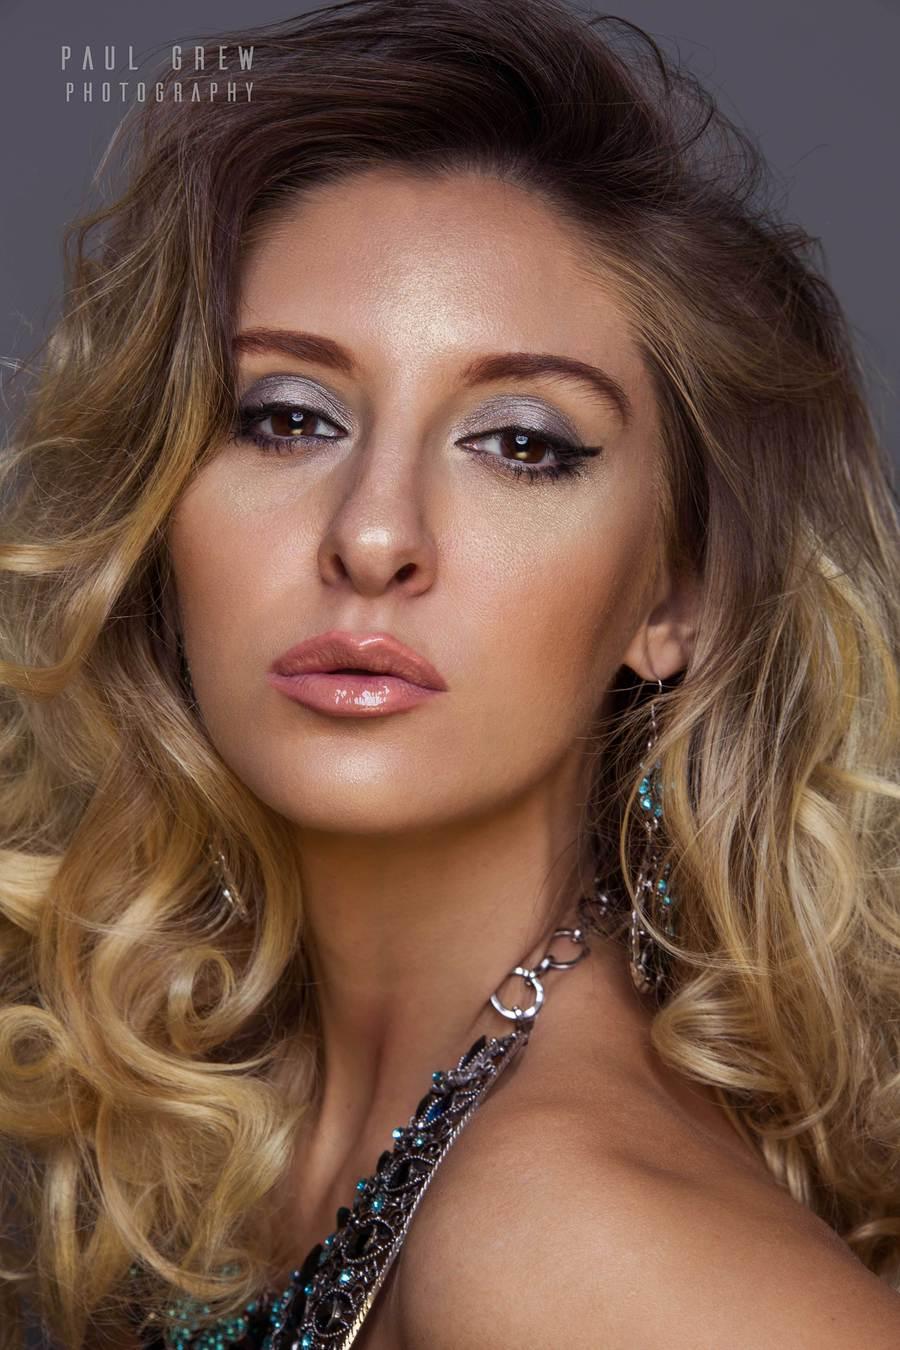 Cheryl beauty / Photography by Grewy, Model ❀ Chiara Toulouki Elisabetta, Post processing by Grewy, Taken at The Hacienda / Uploaded 30th December 2017 @ 10:13 AM